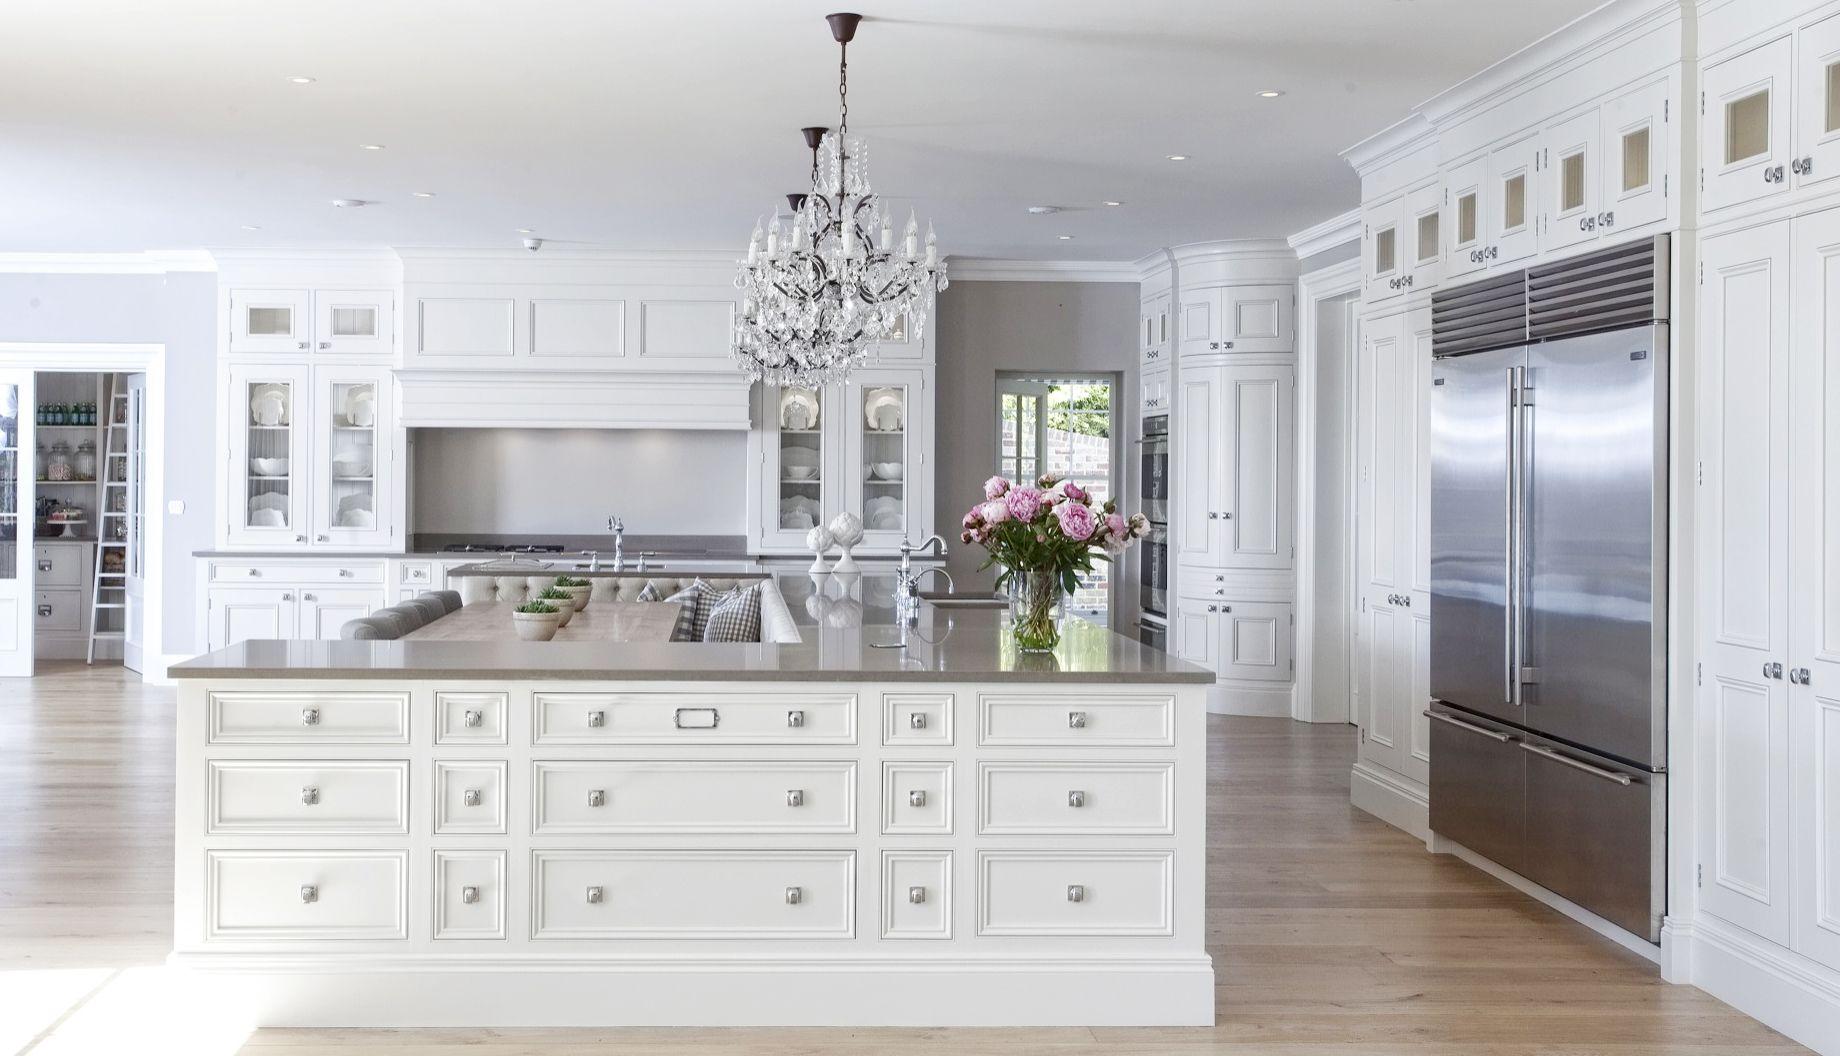 These Luxury Kitchens Will Make You Want To Cook All Day Luxury Kitchens Interior Design Kitchen Kitchen Design